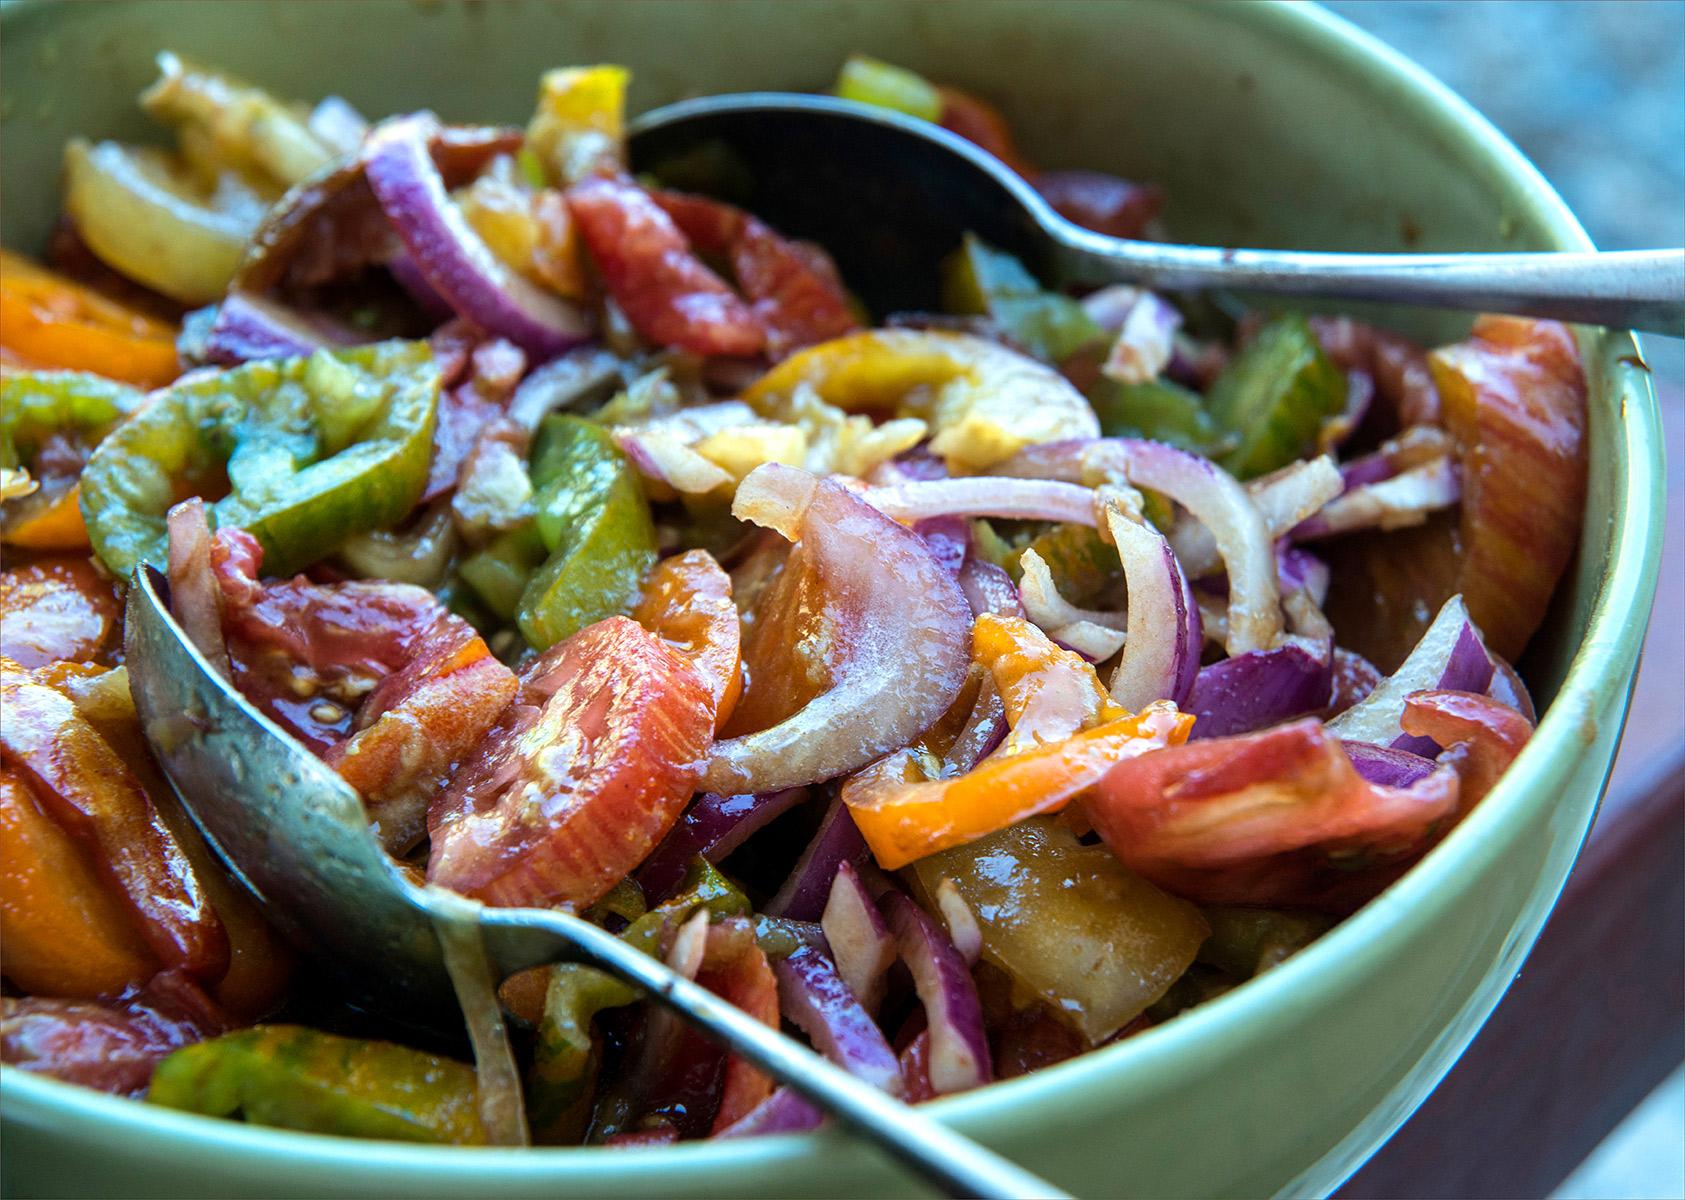 tomatoe-and-onion-salad-Carl-Kravats-Photography